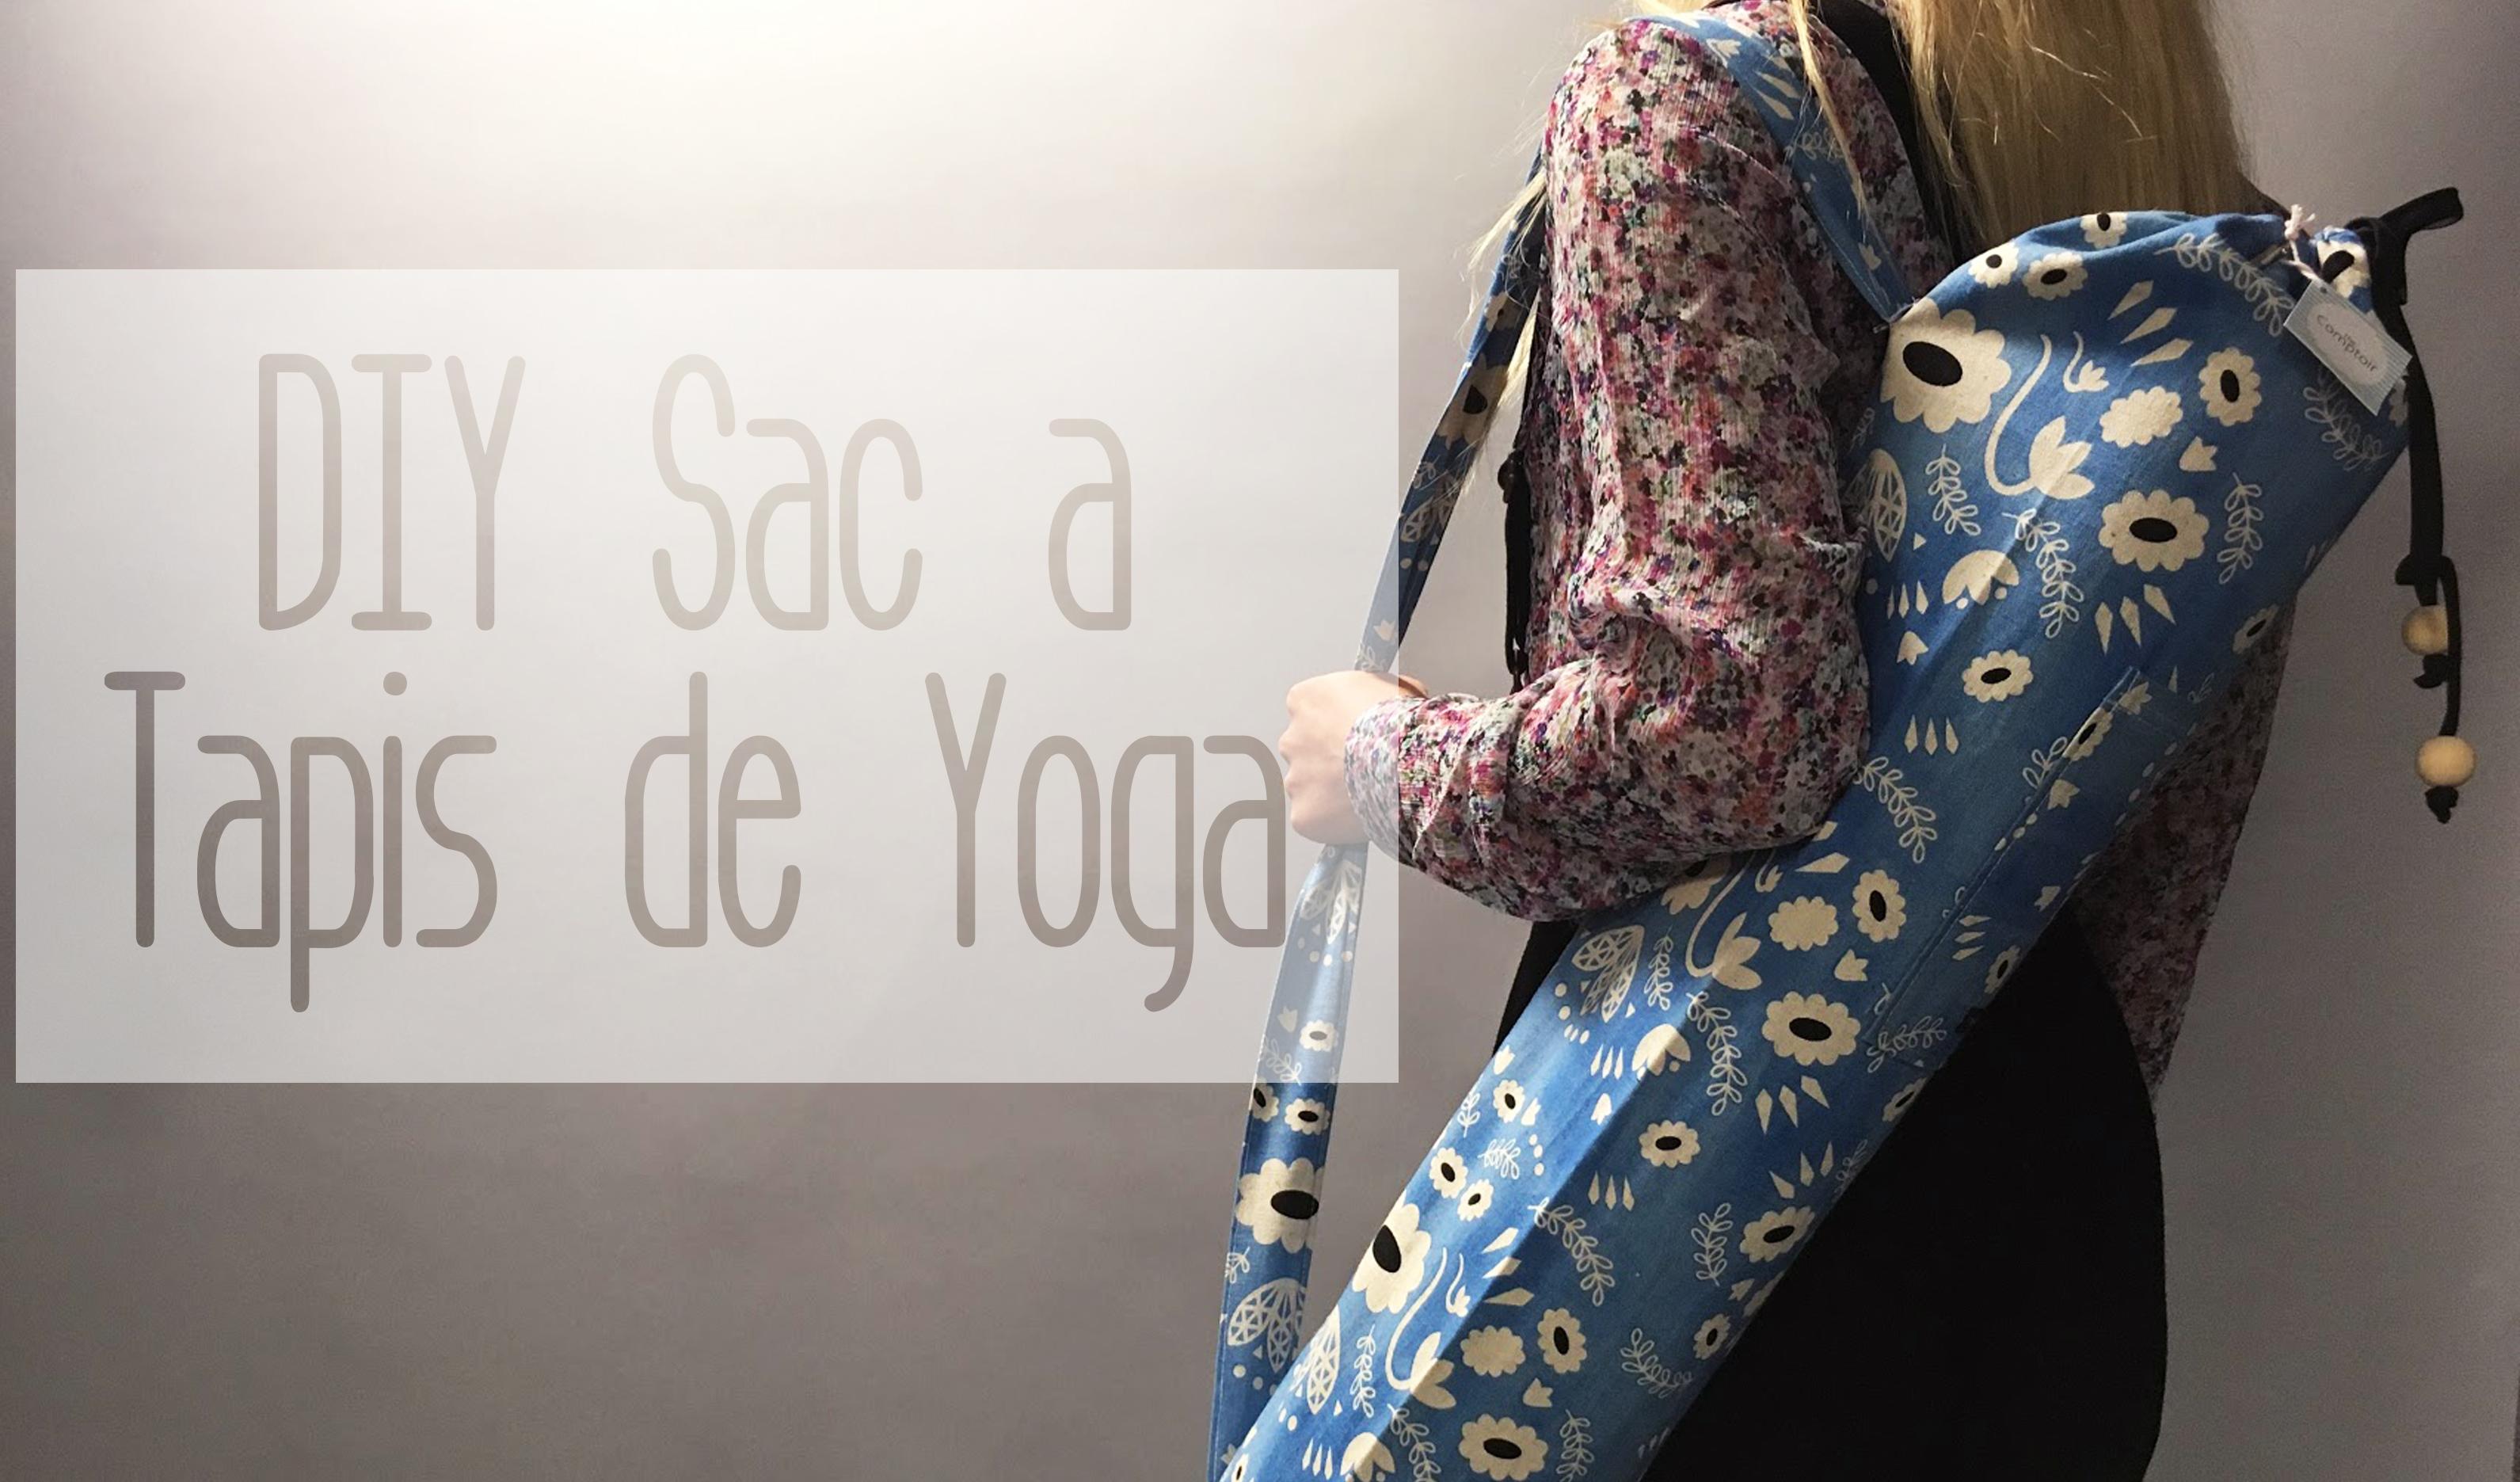 diy couture le sac a tapis de yoga